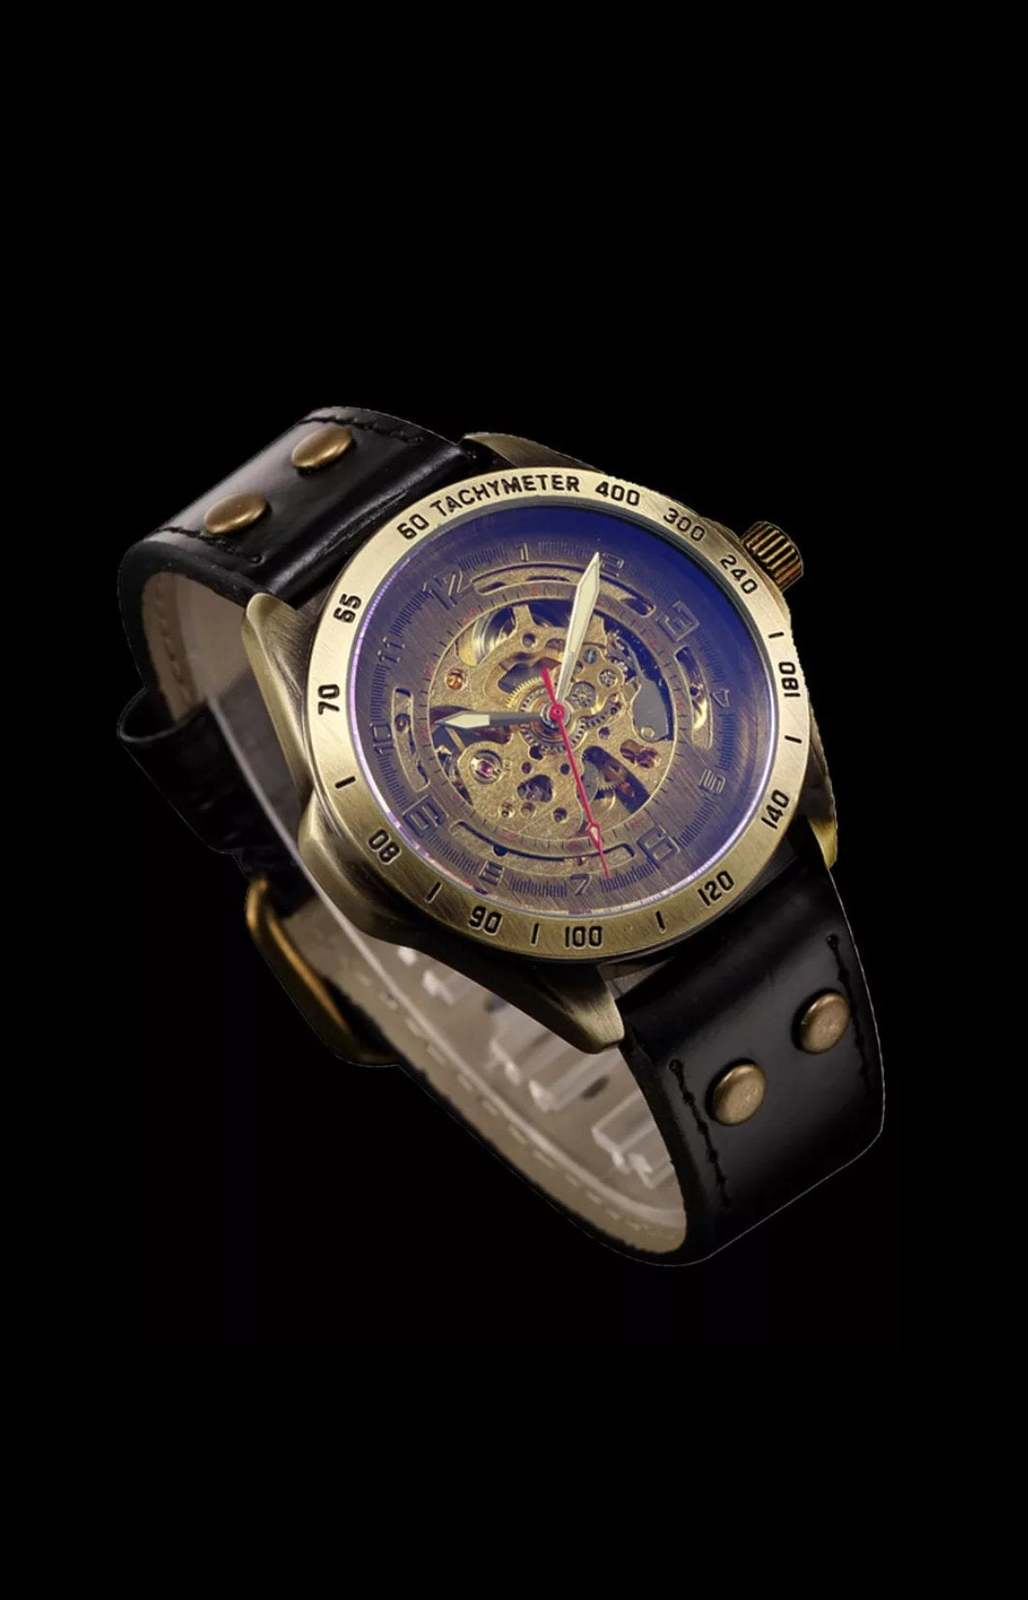 Luxury Vintage Retro Automatic Mechanical Watch- Automatics Self-Wind- Antique w image 3